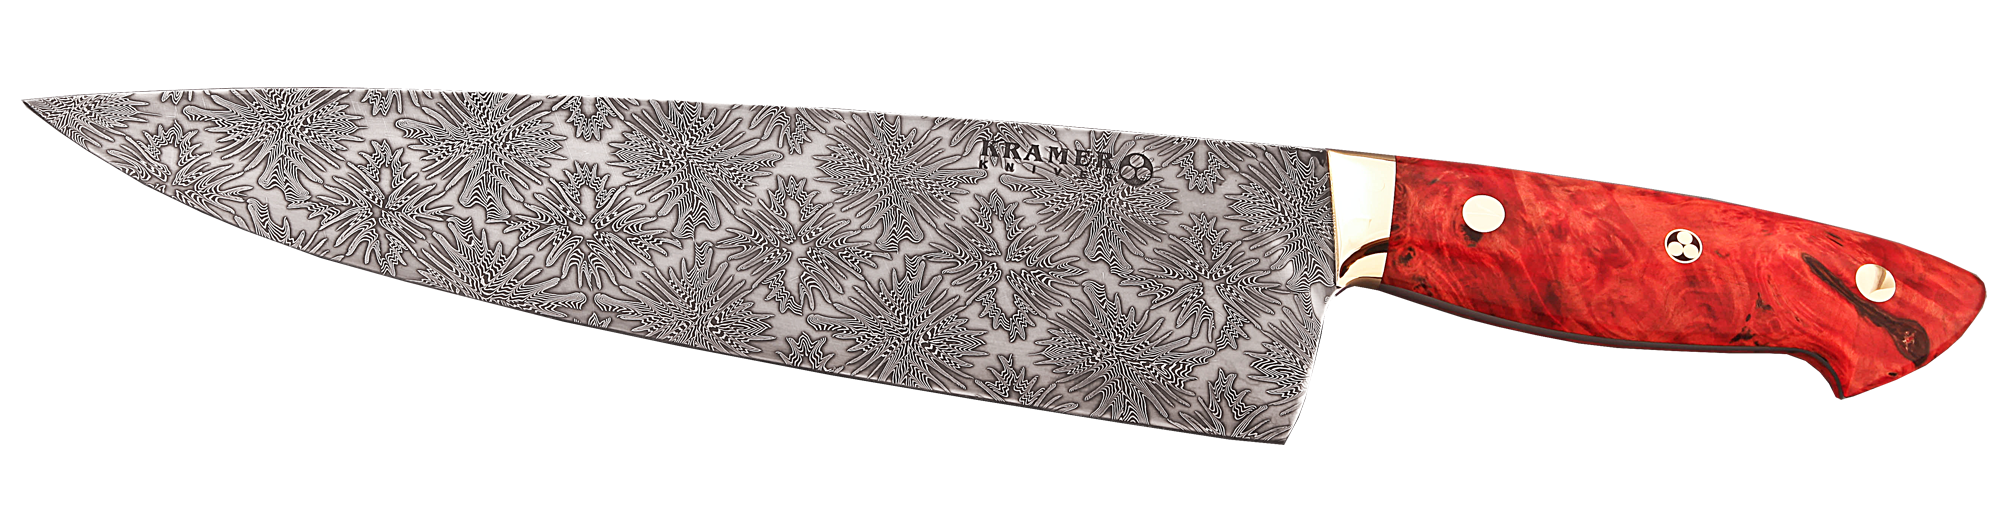 Uncategorized Damascus Kitchen Knives bob kramer knives gallery 10 chef knife pulse mosaic damascus european style dyed big leaf maple handle